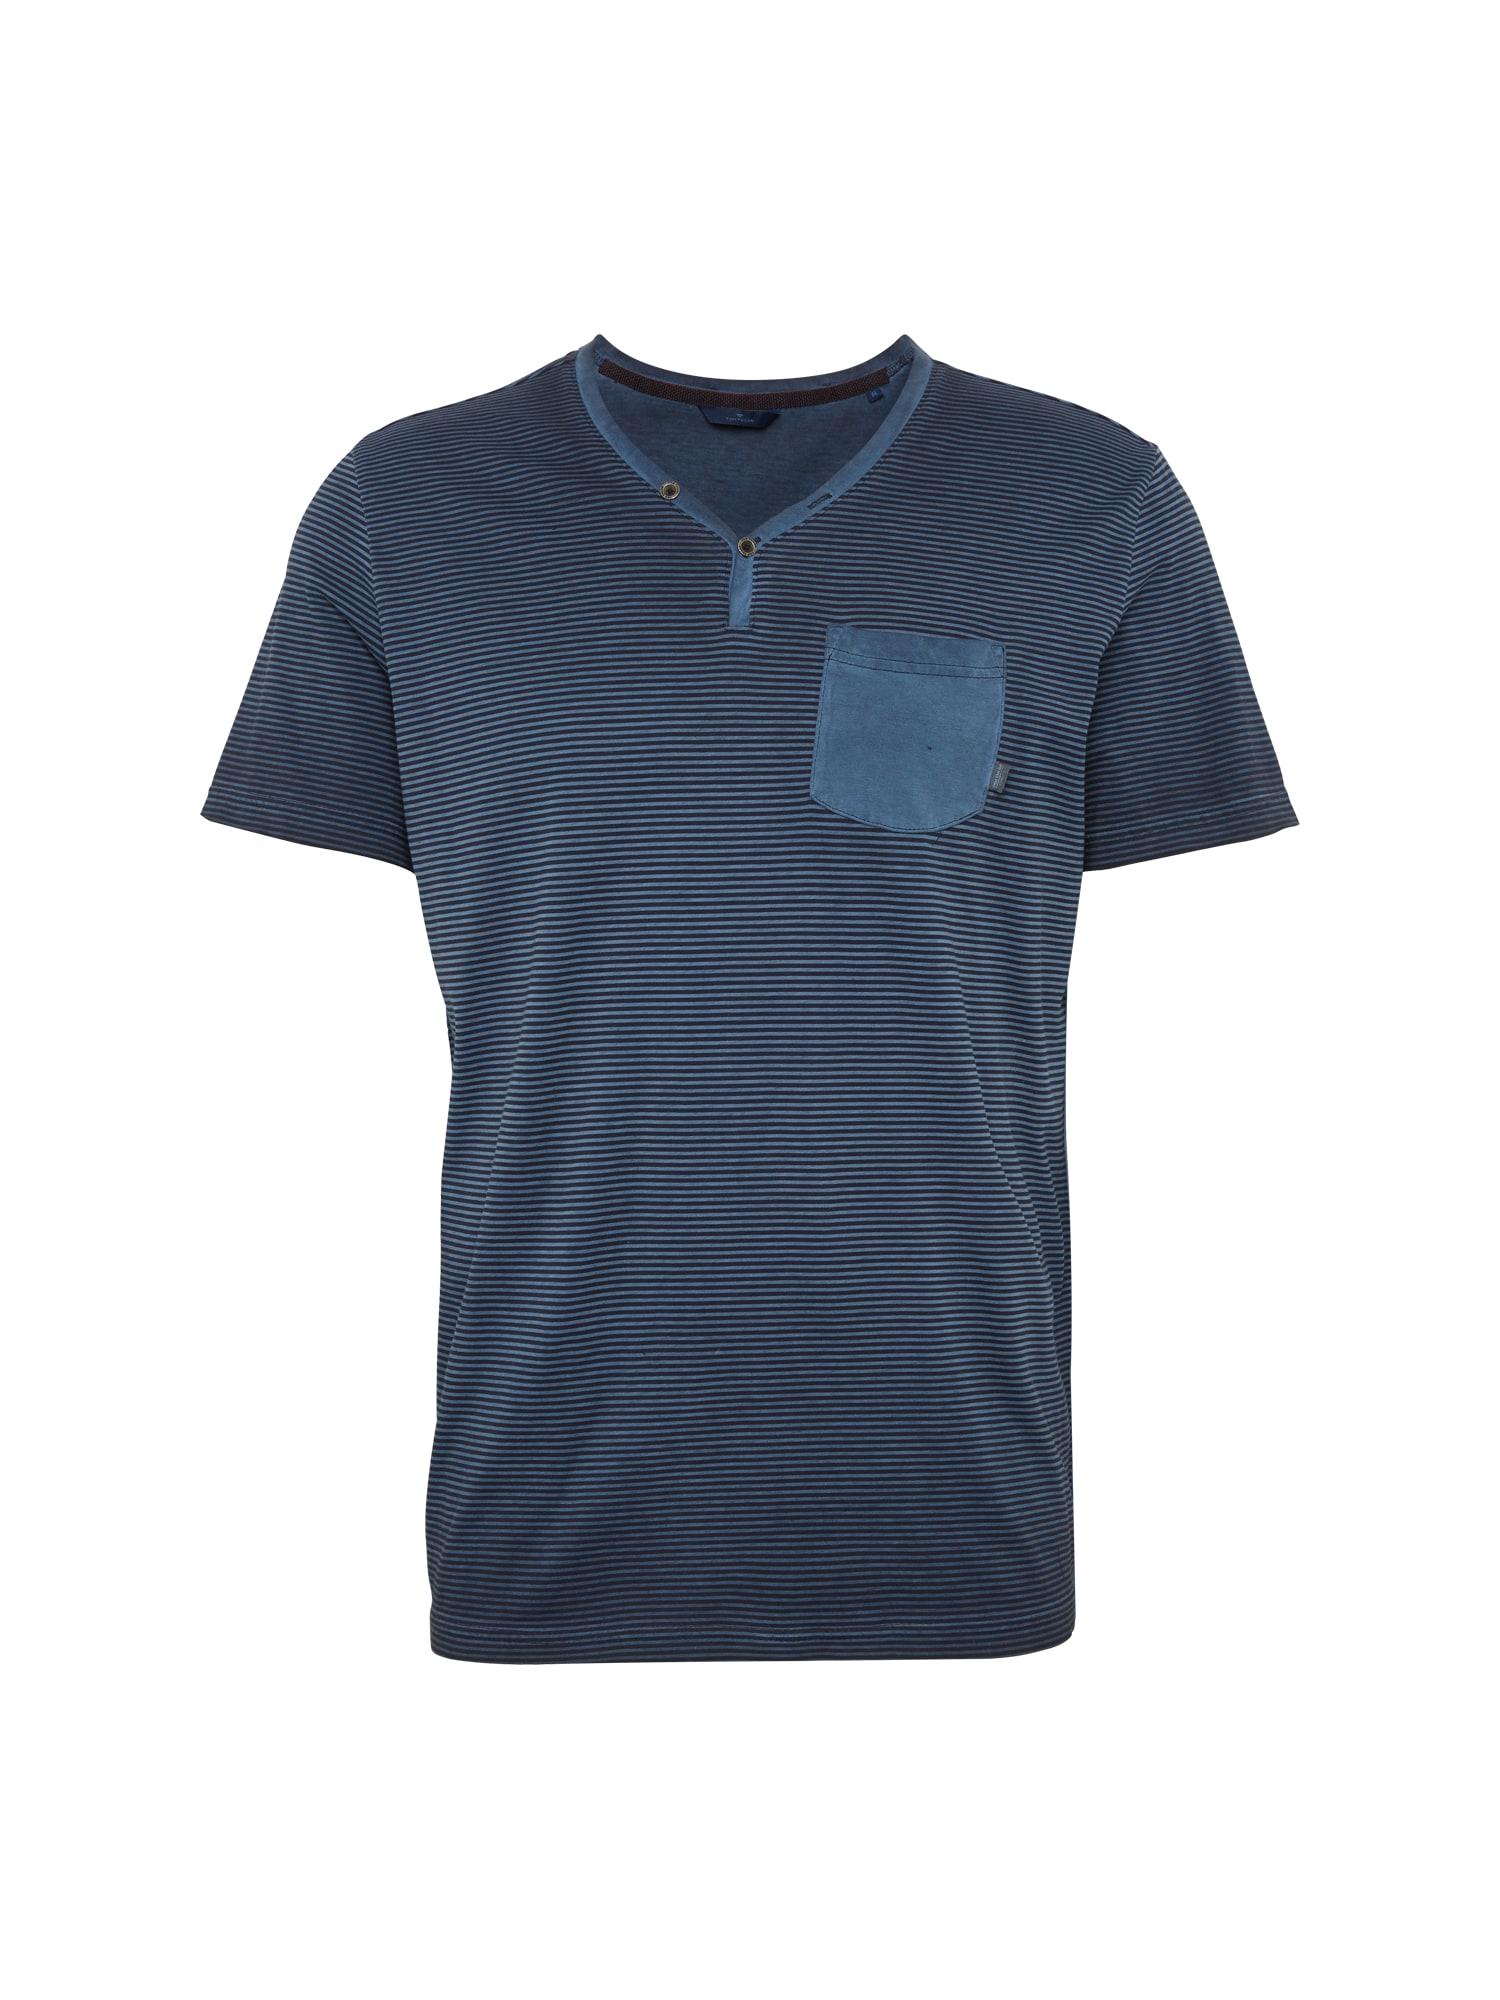 Shirt 'Striped serafino with w'